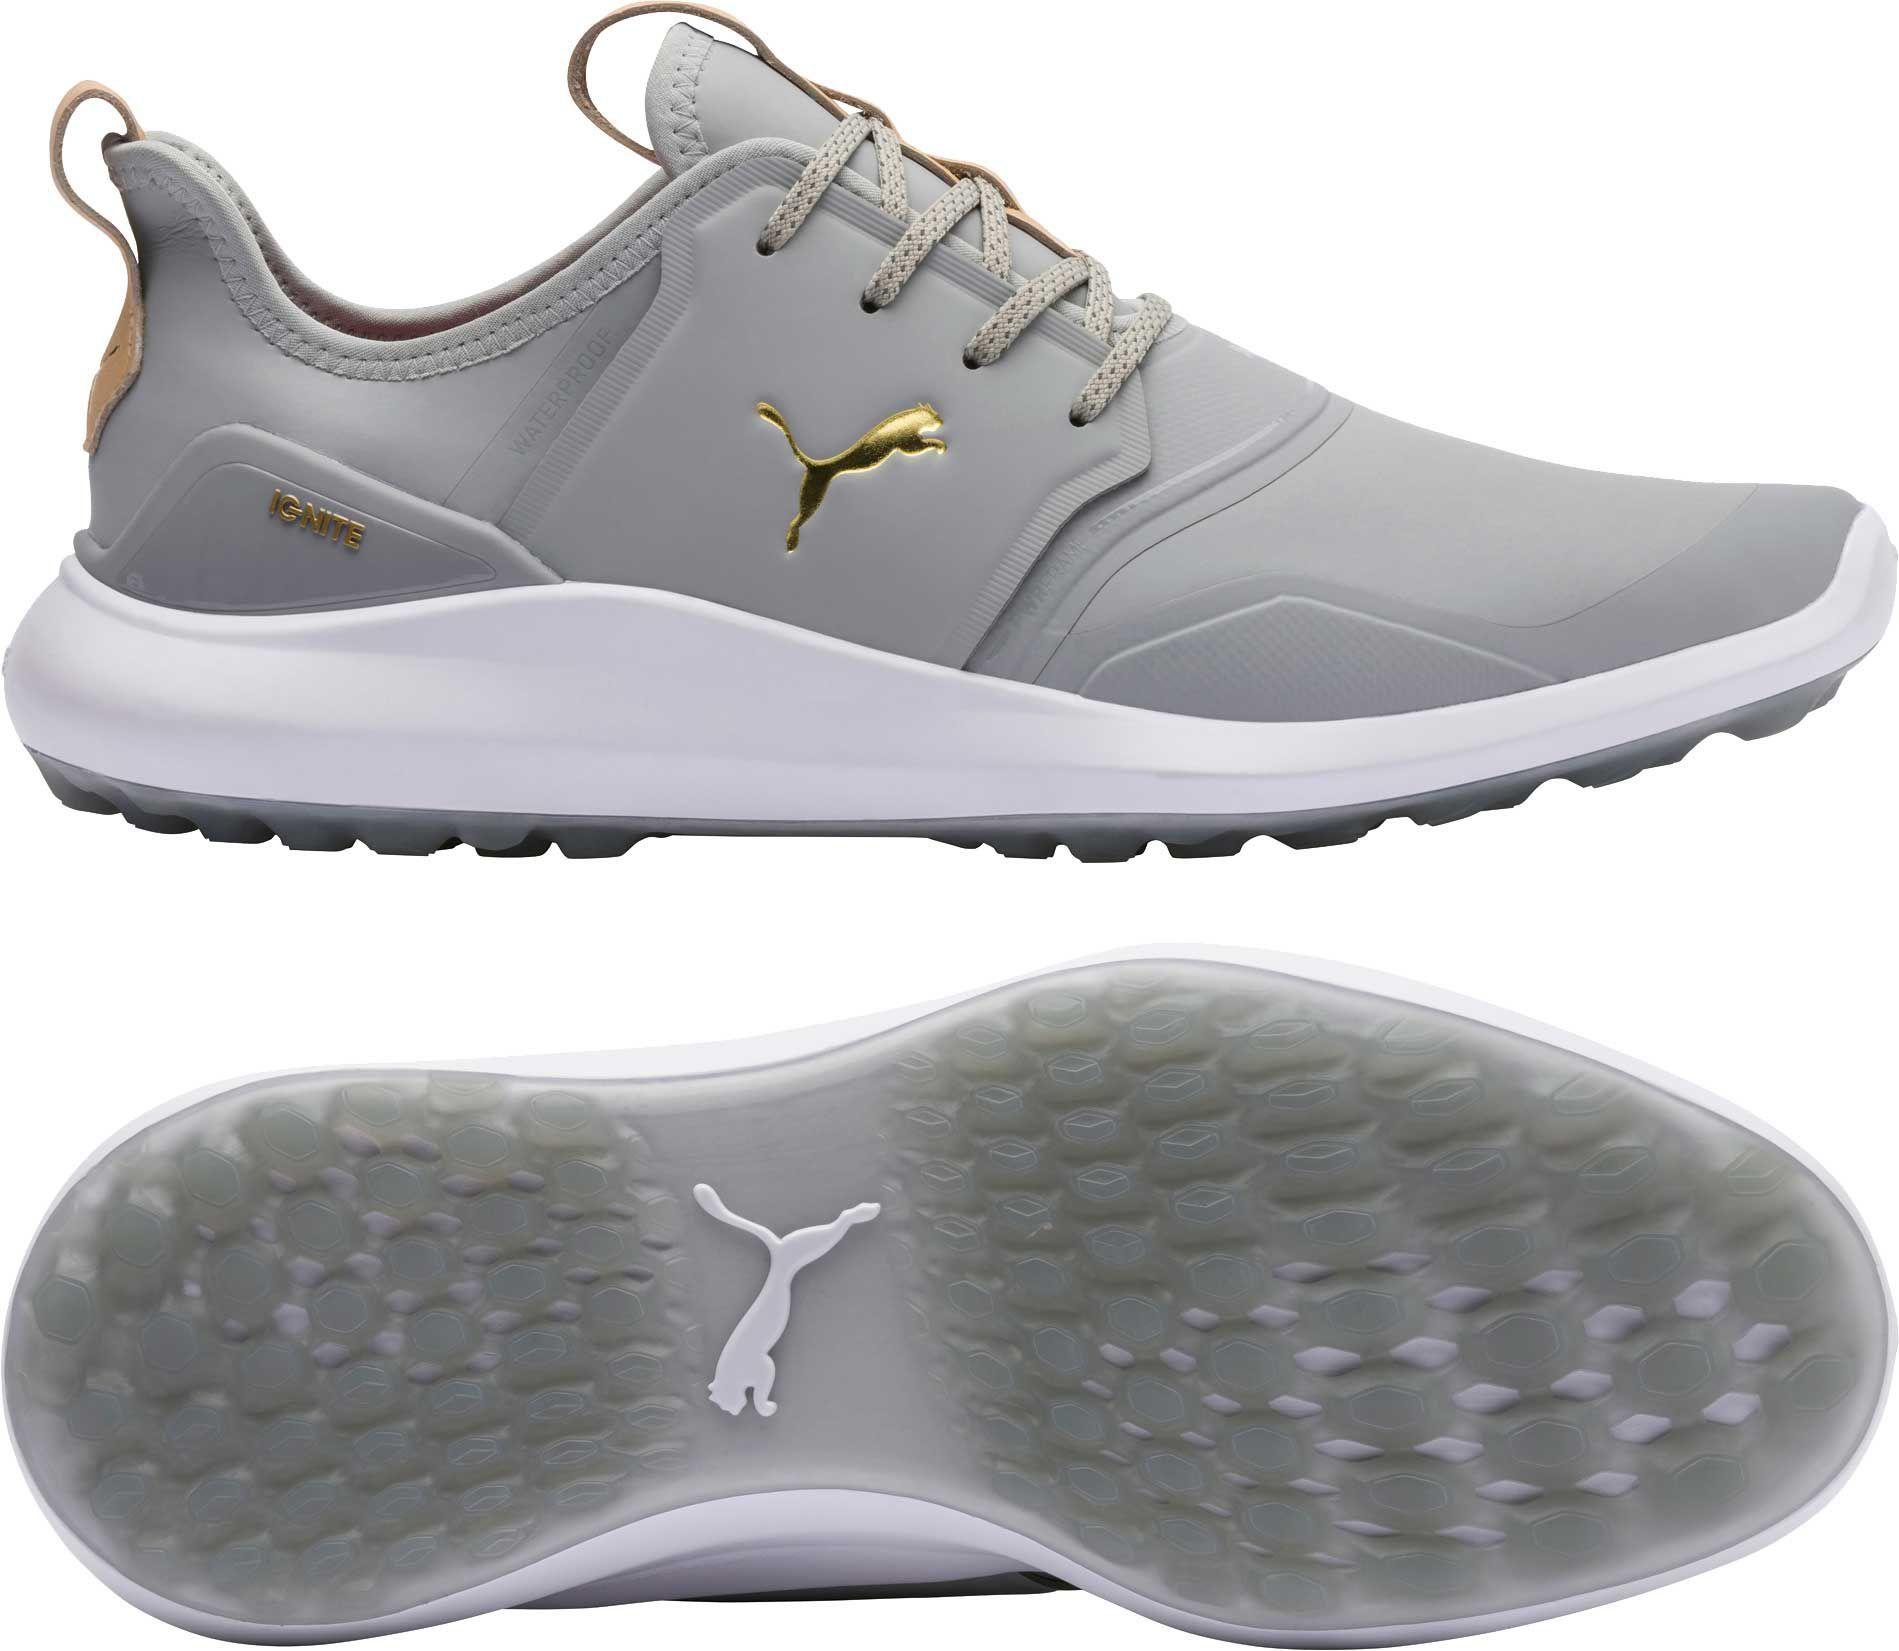 Puma Men's Ignite NXT Pro Golf Shoes   Golf fashion, Disc